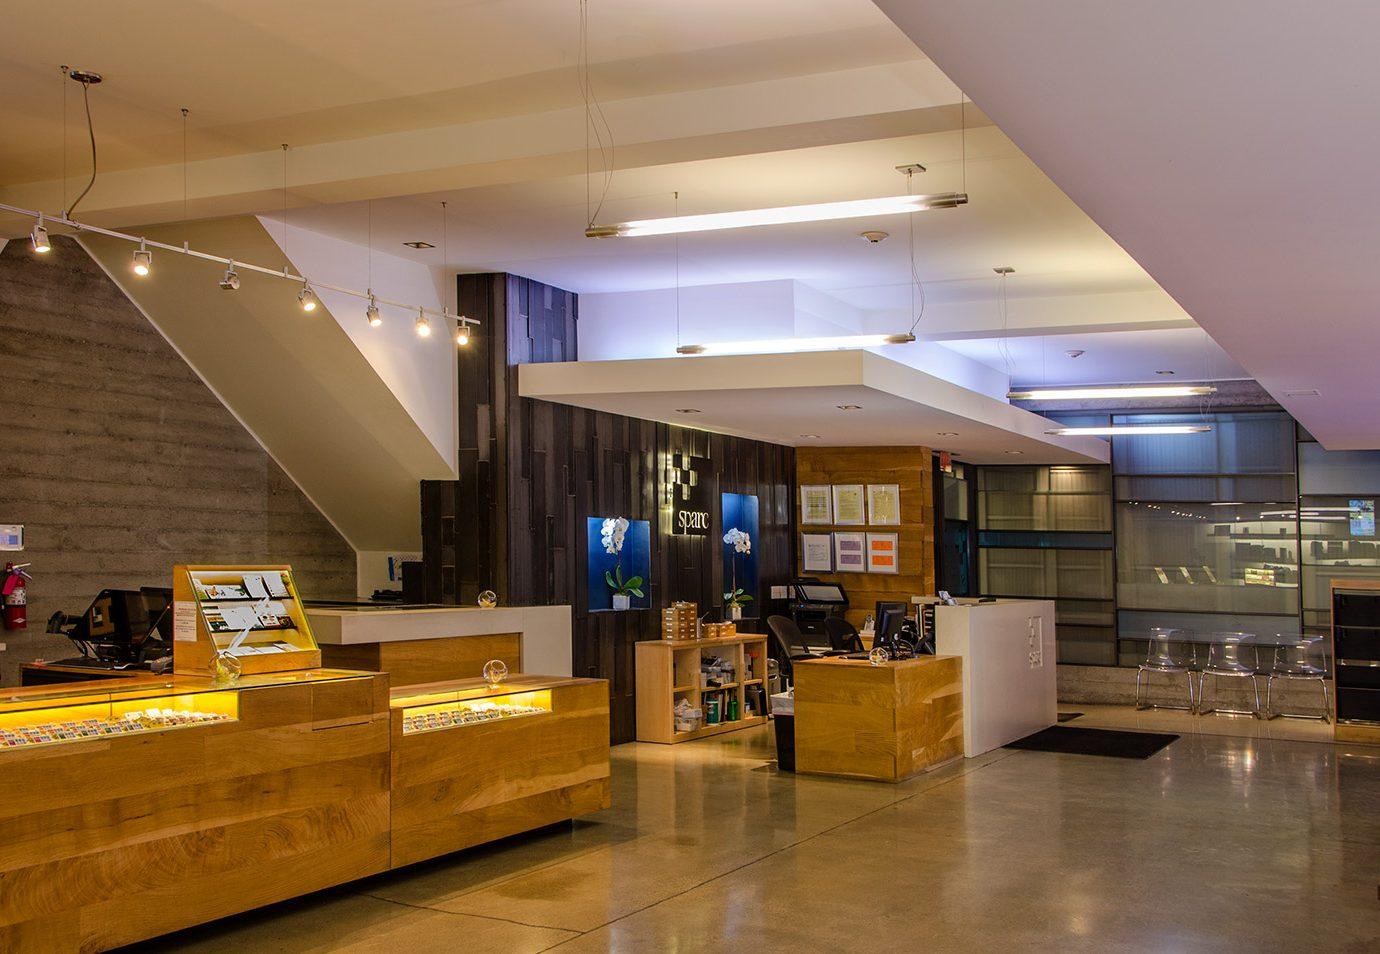 Interior of SPARC in San Francisco